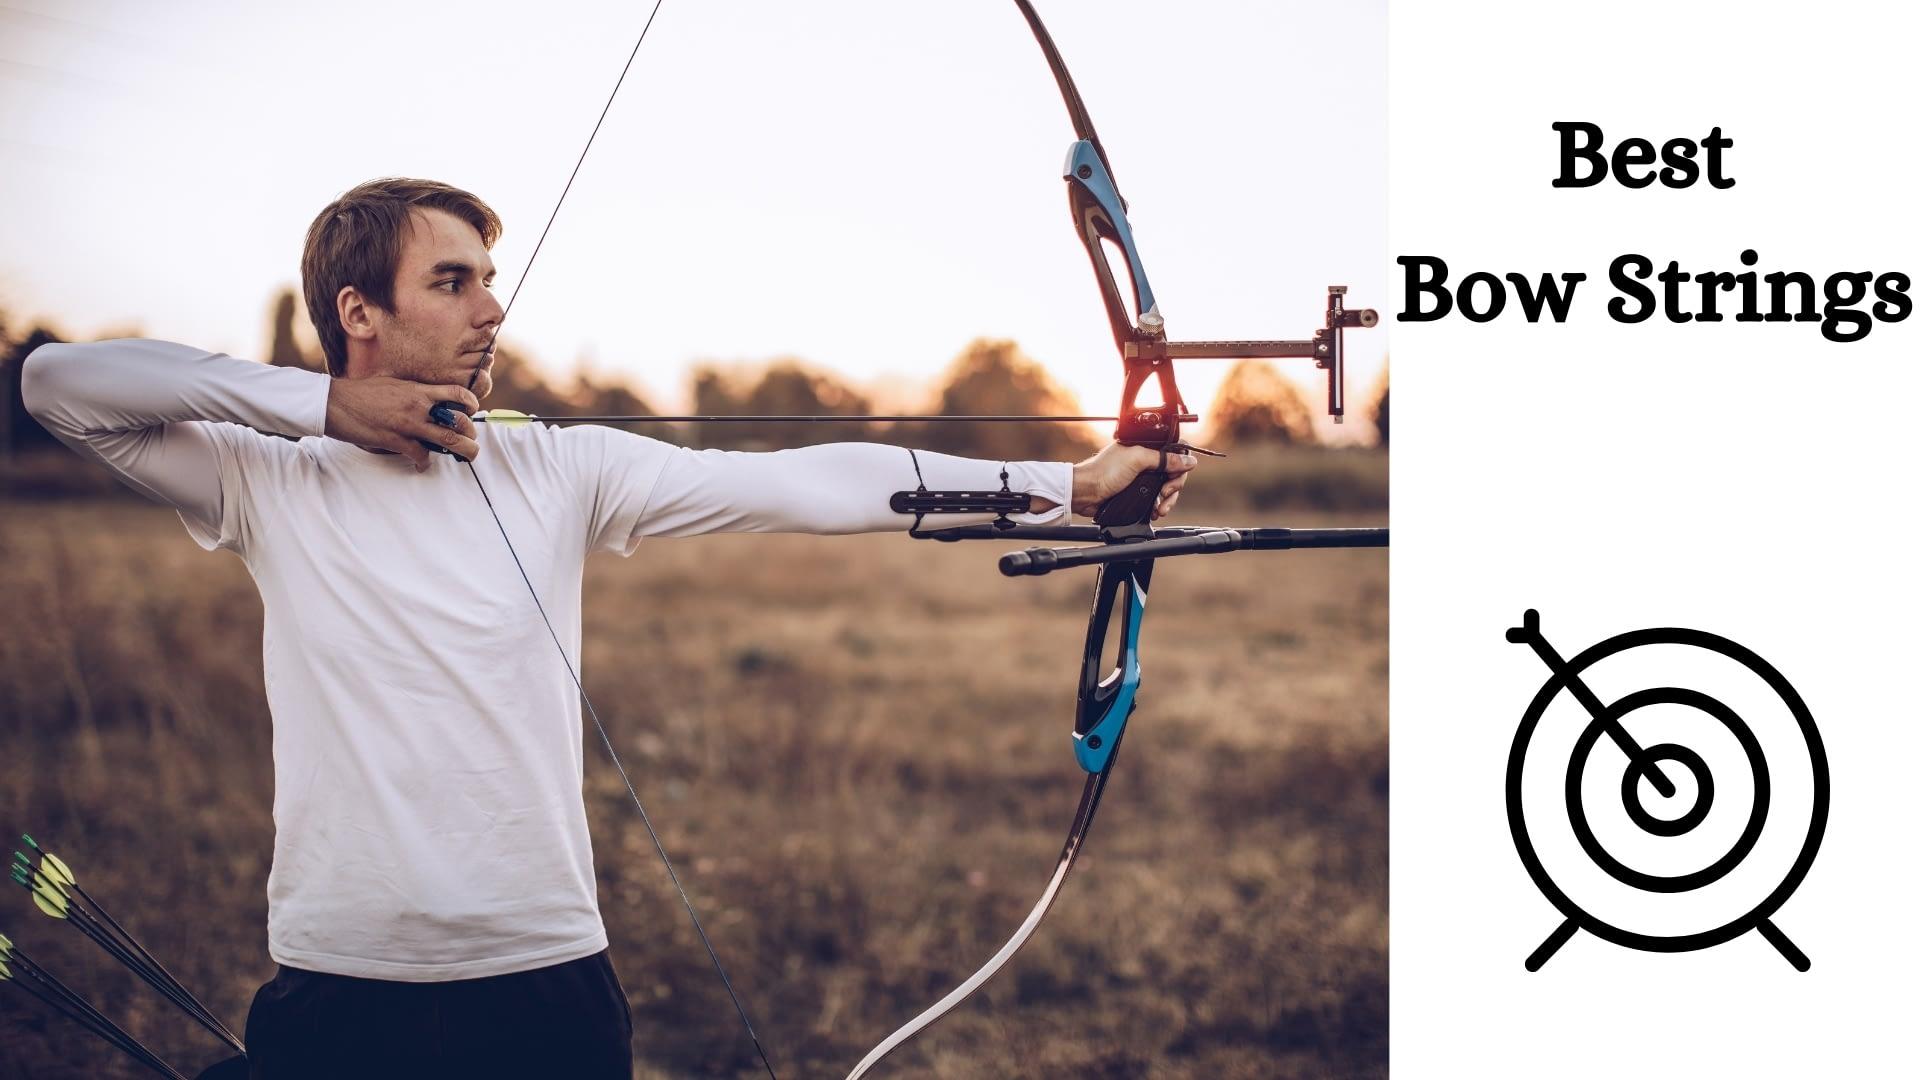 Best Bow Strings